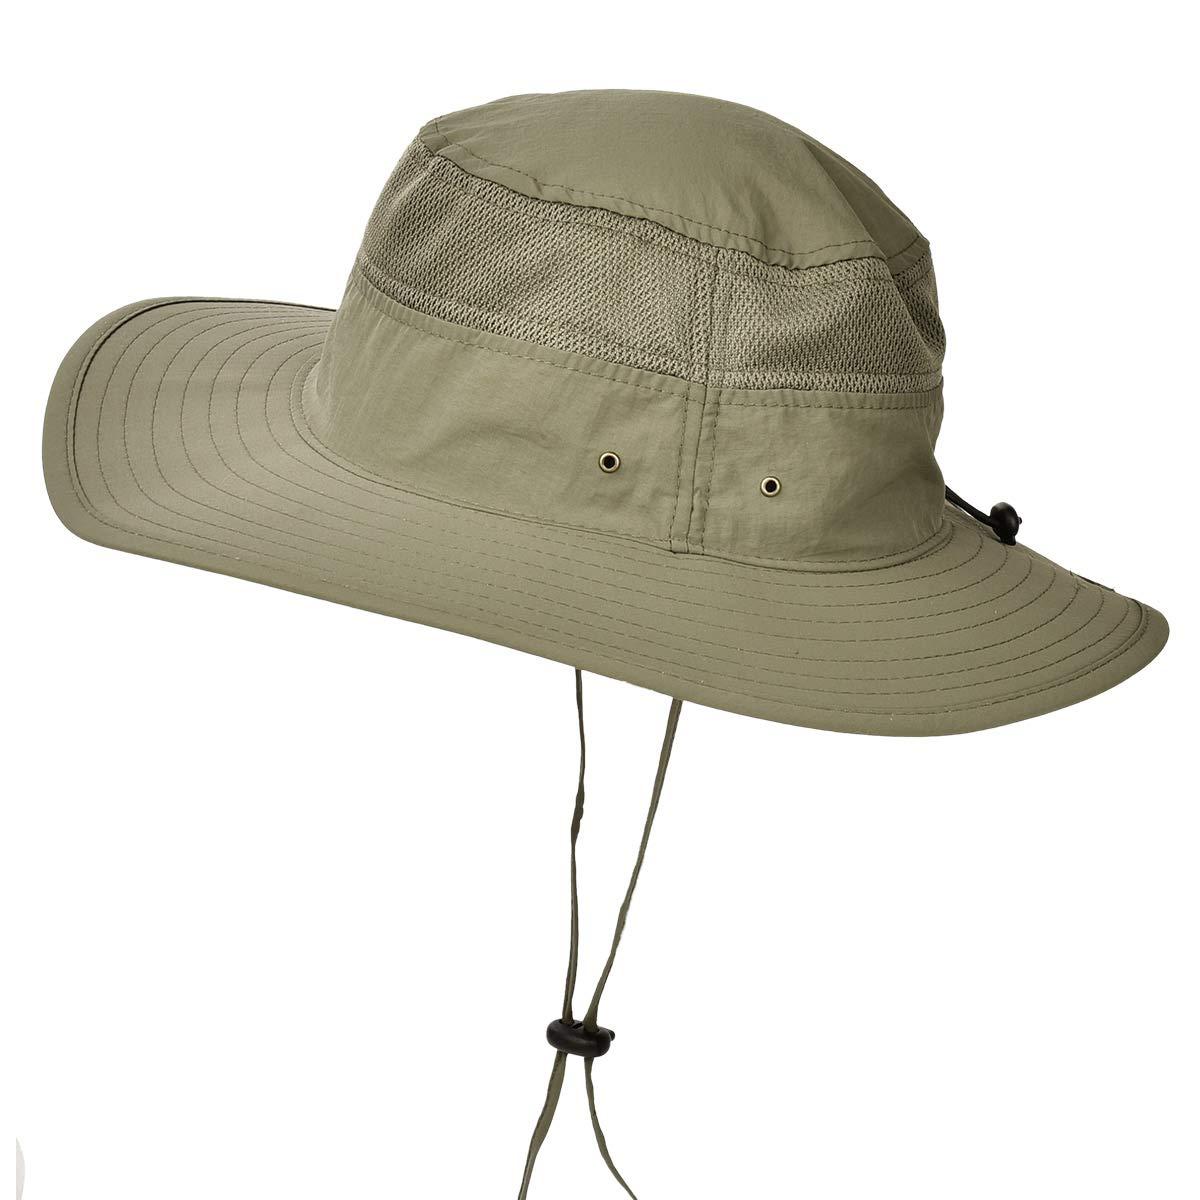 291bff8235fba ENJOYFUR Men Women Unisex Sun Hats Outdoor Wide Large Brim Fishing hat Mesh  Bucket UV UPF 50+ Protection Quick Dry Army Green at Amazon Men s Clothing  store ...